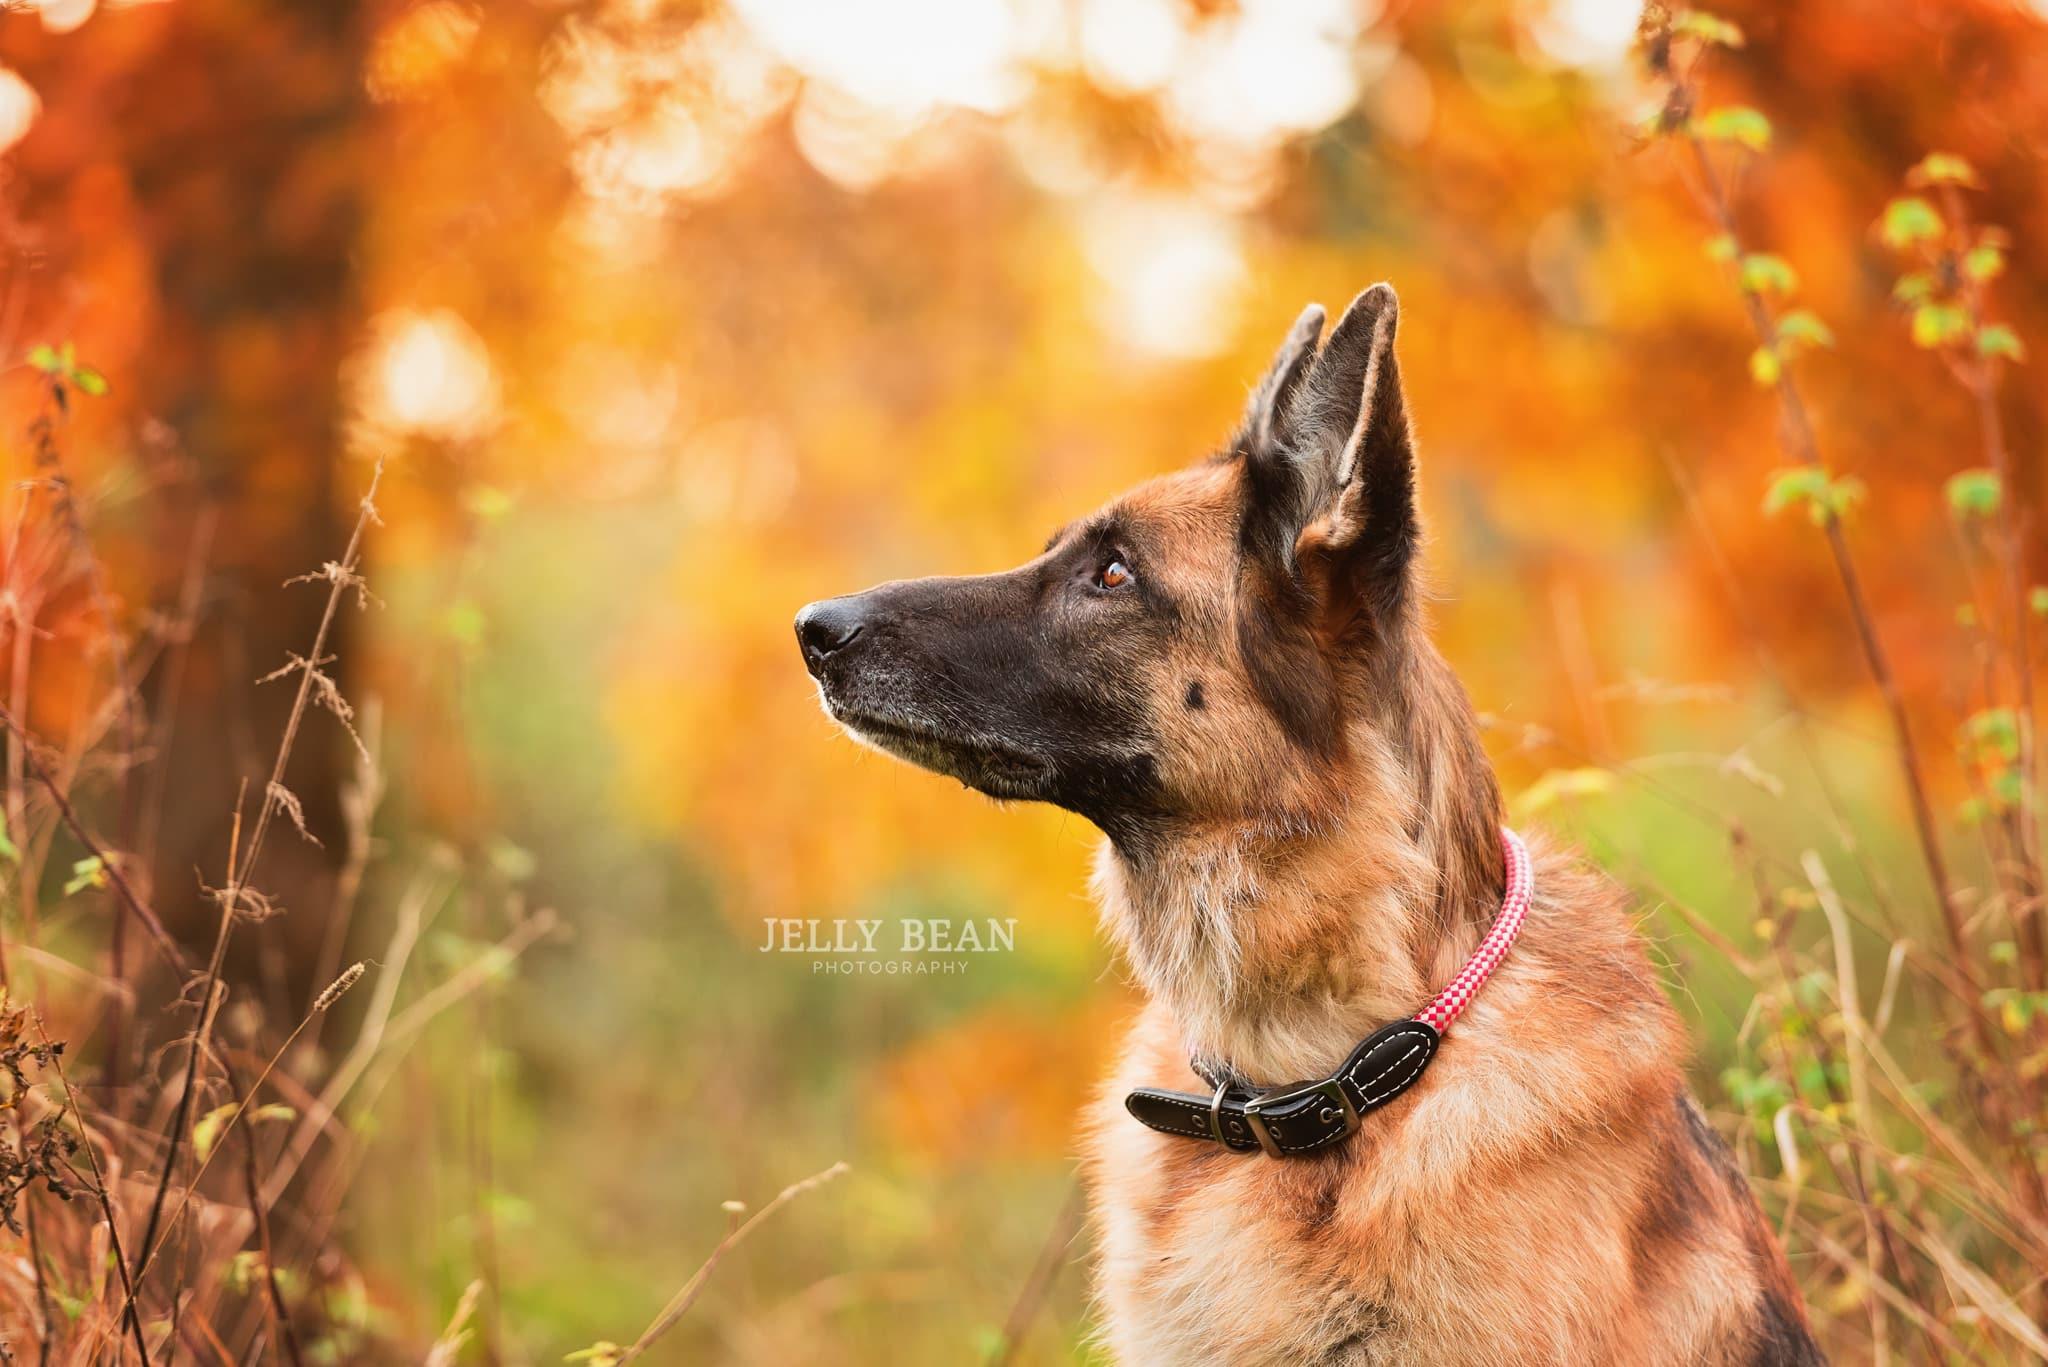 German Shepherd dog profile